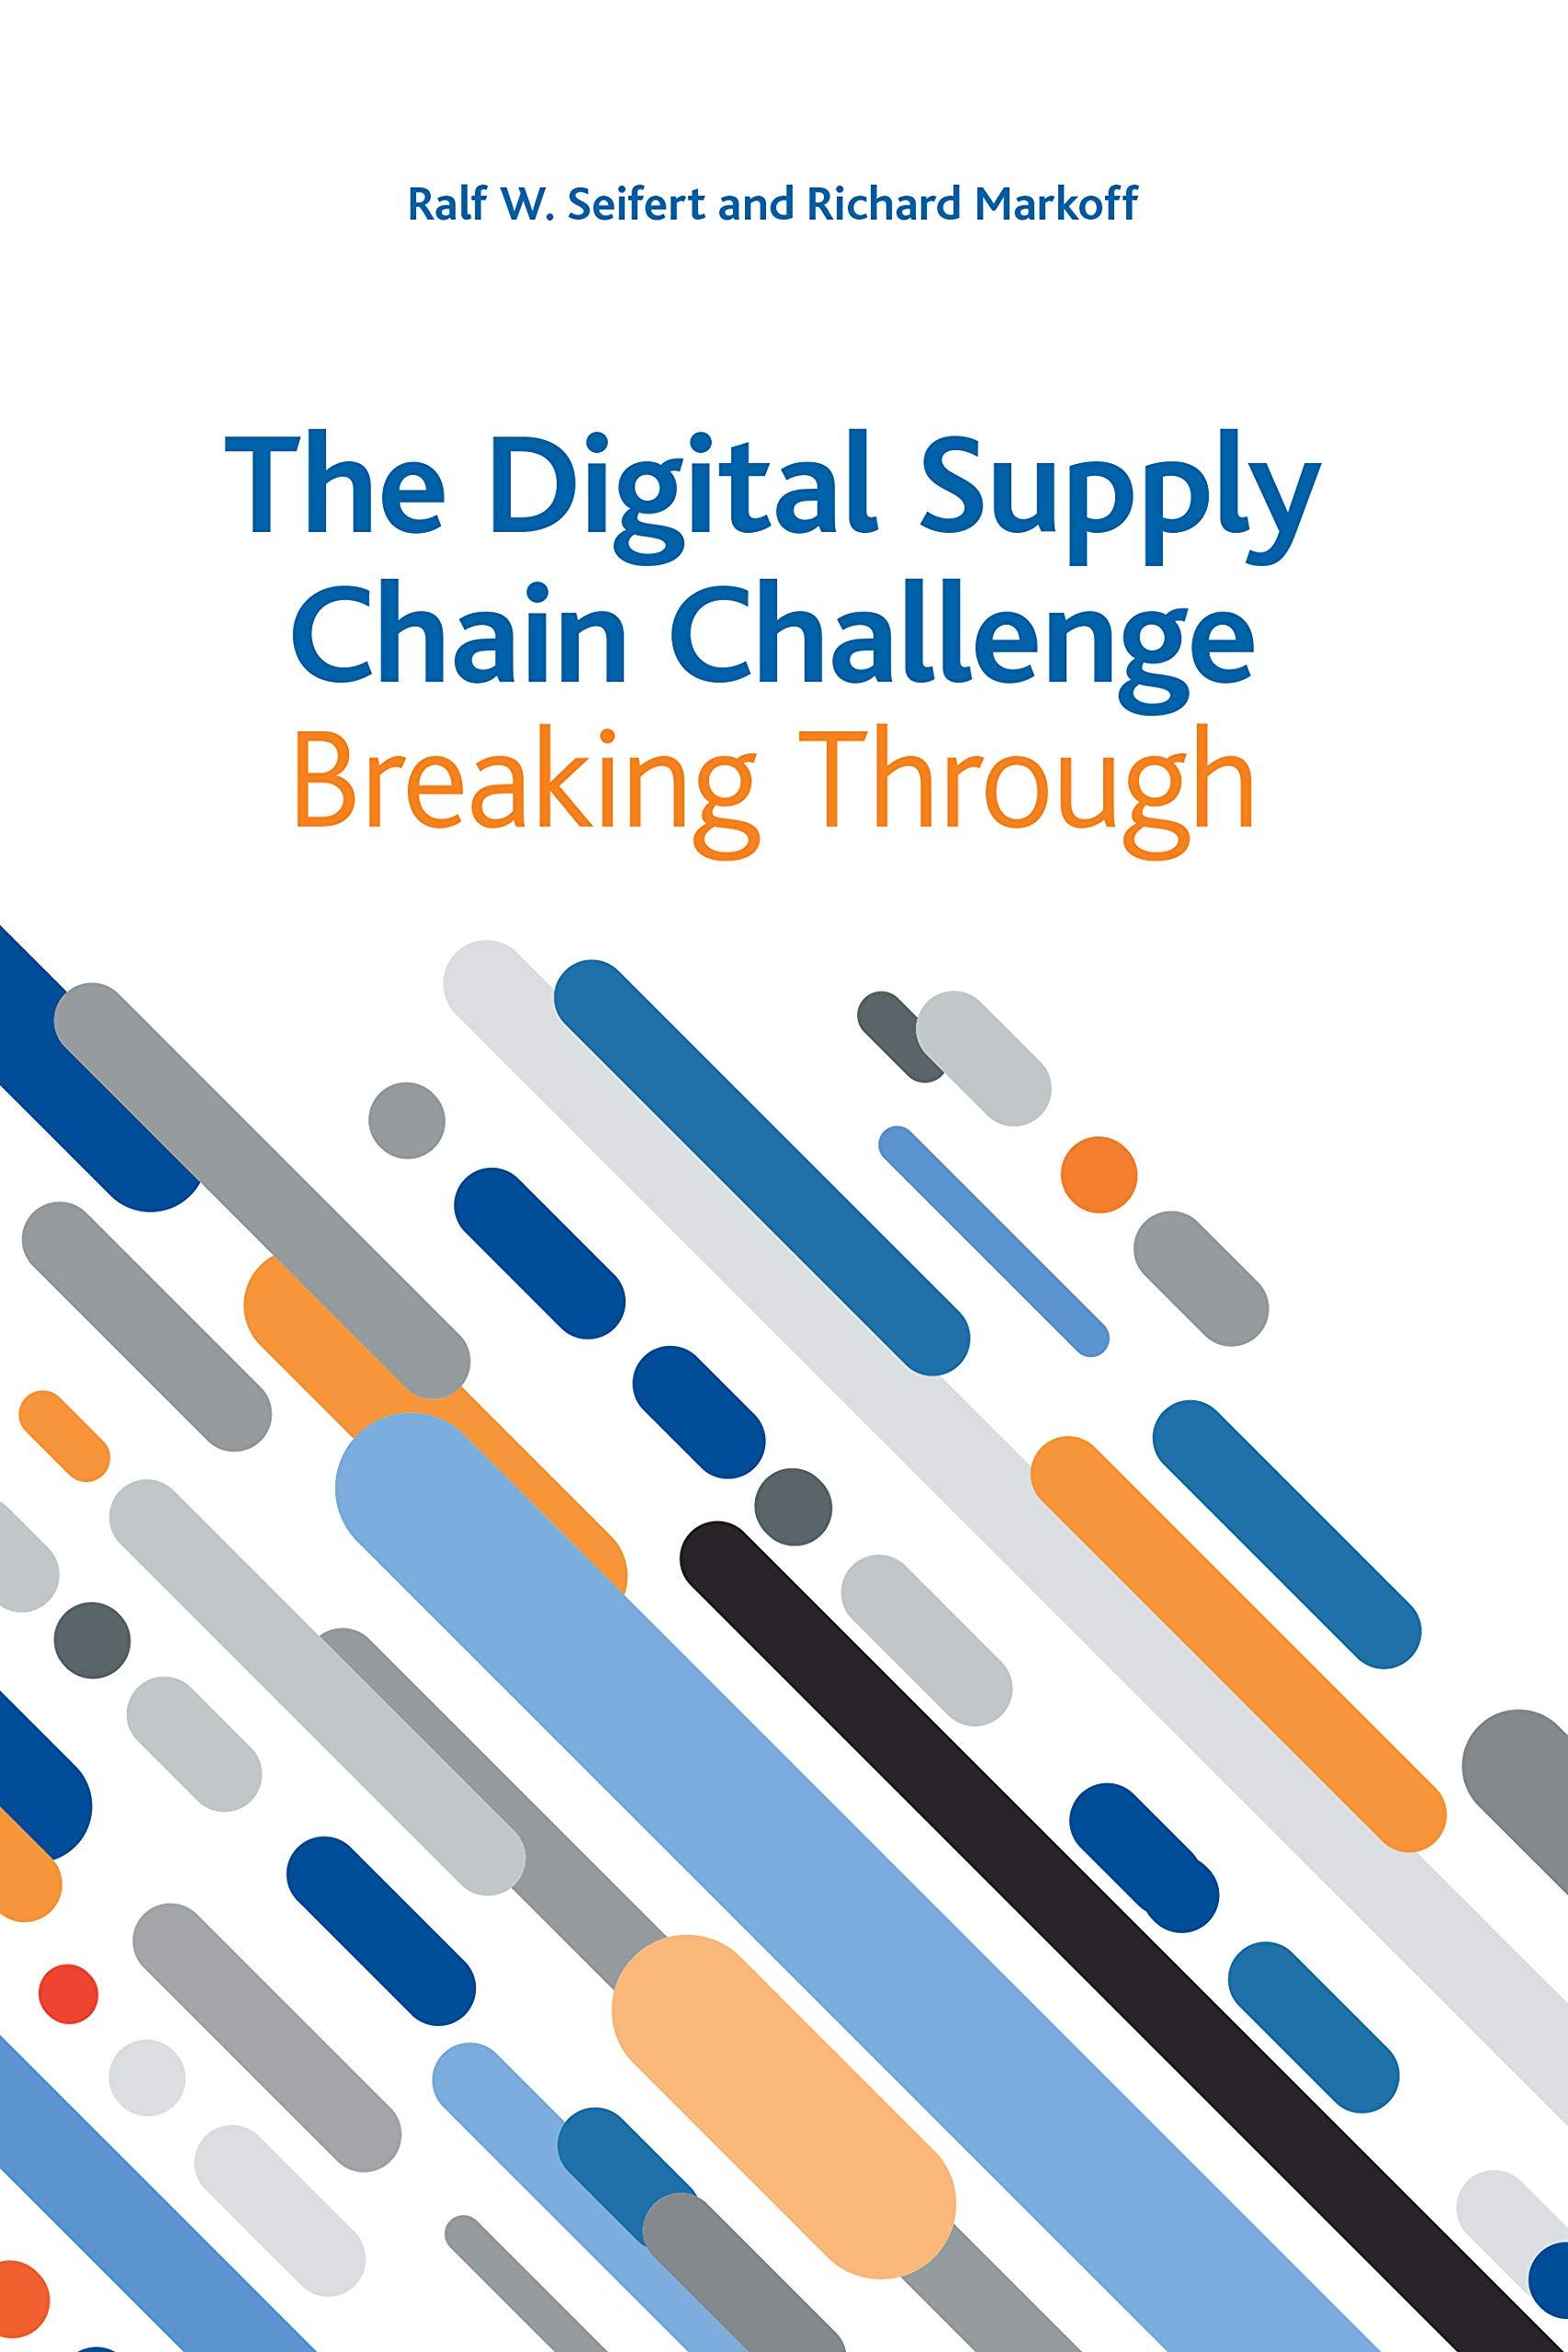 The Digital Supply Chain Challenge: Breaking Through